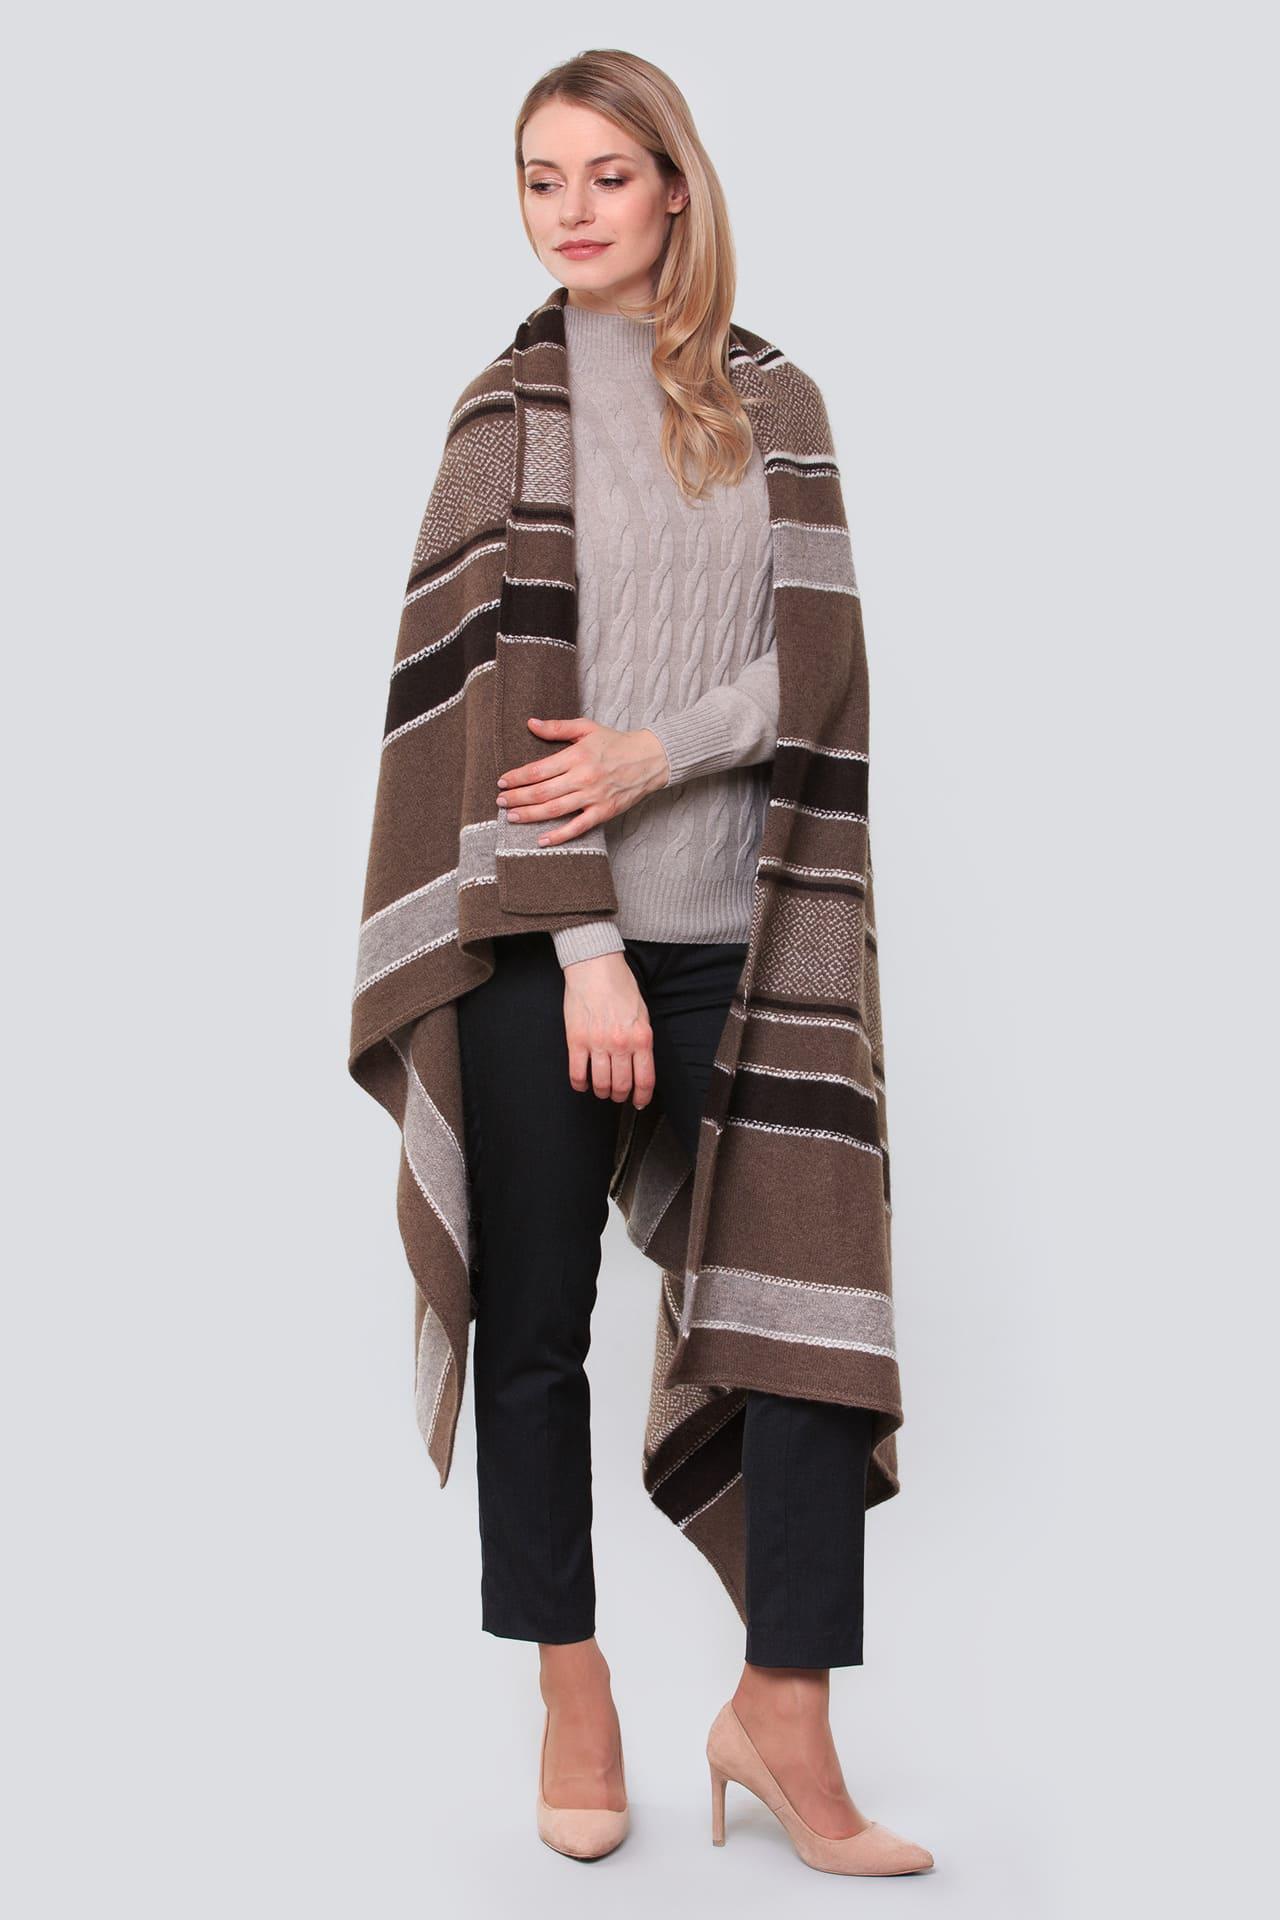 Одеяло из пуха яка и кашемира